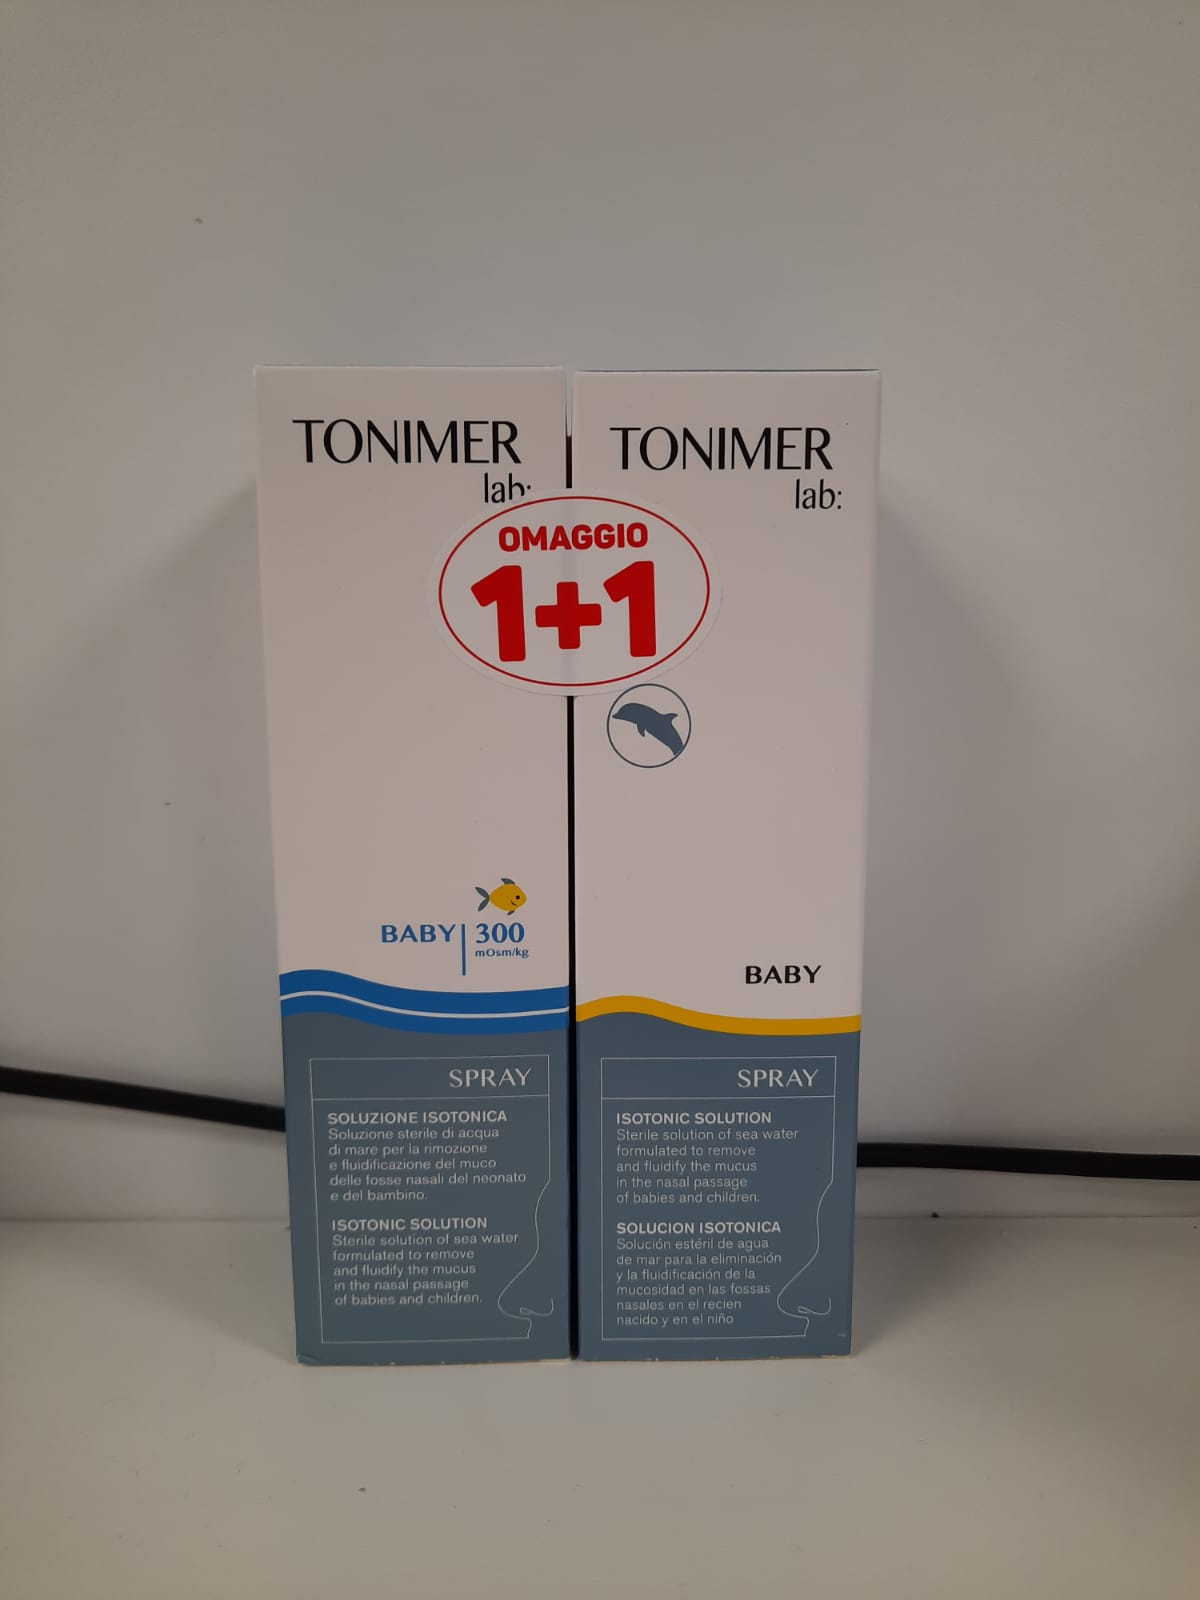 Tonimer Lab Baby Spray Soluzione Isotonica 100ml + 100ml 1+1 Omaggio - Arcafarma.it